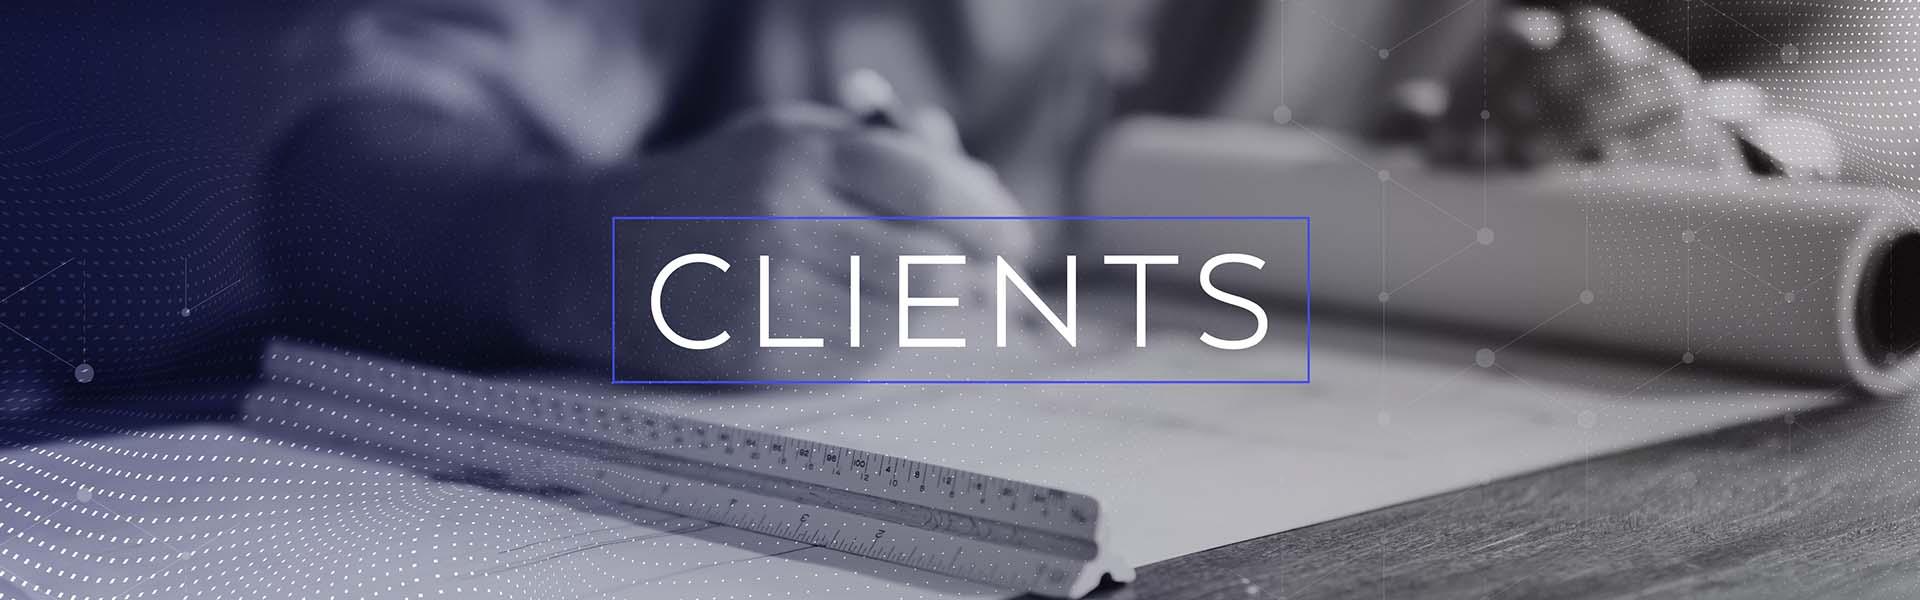 CC_Clients Header